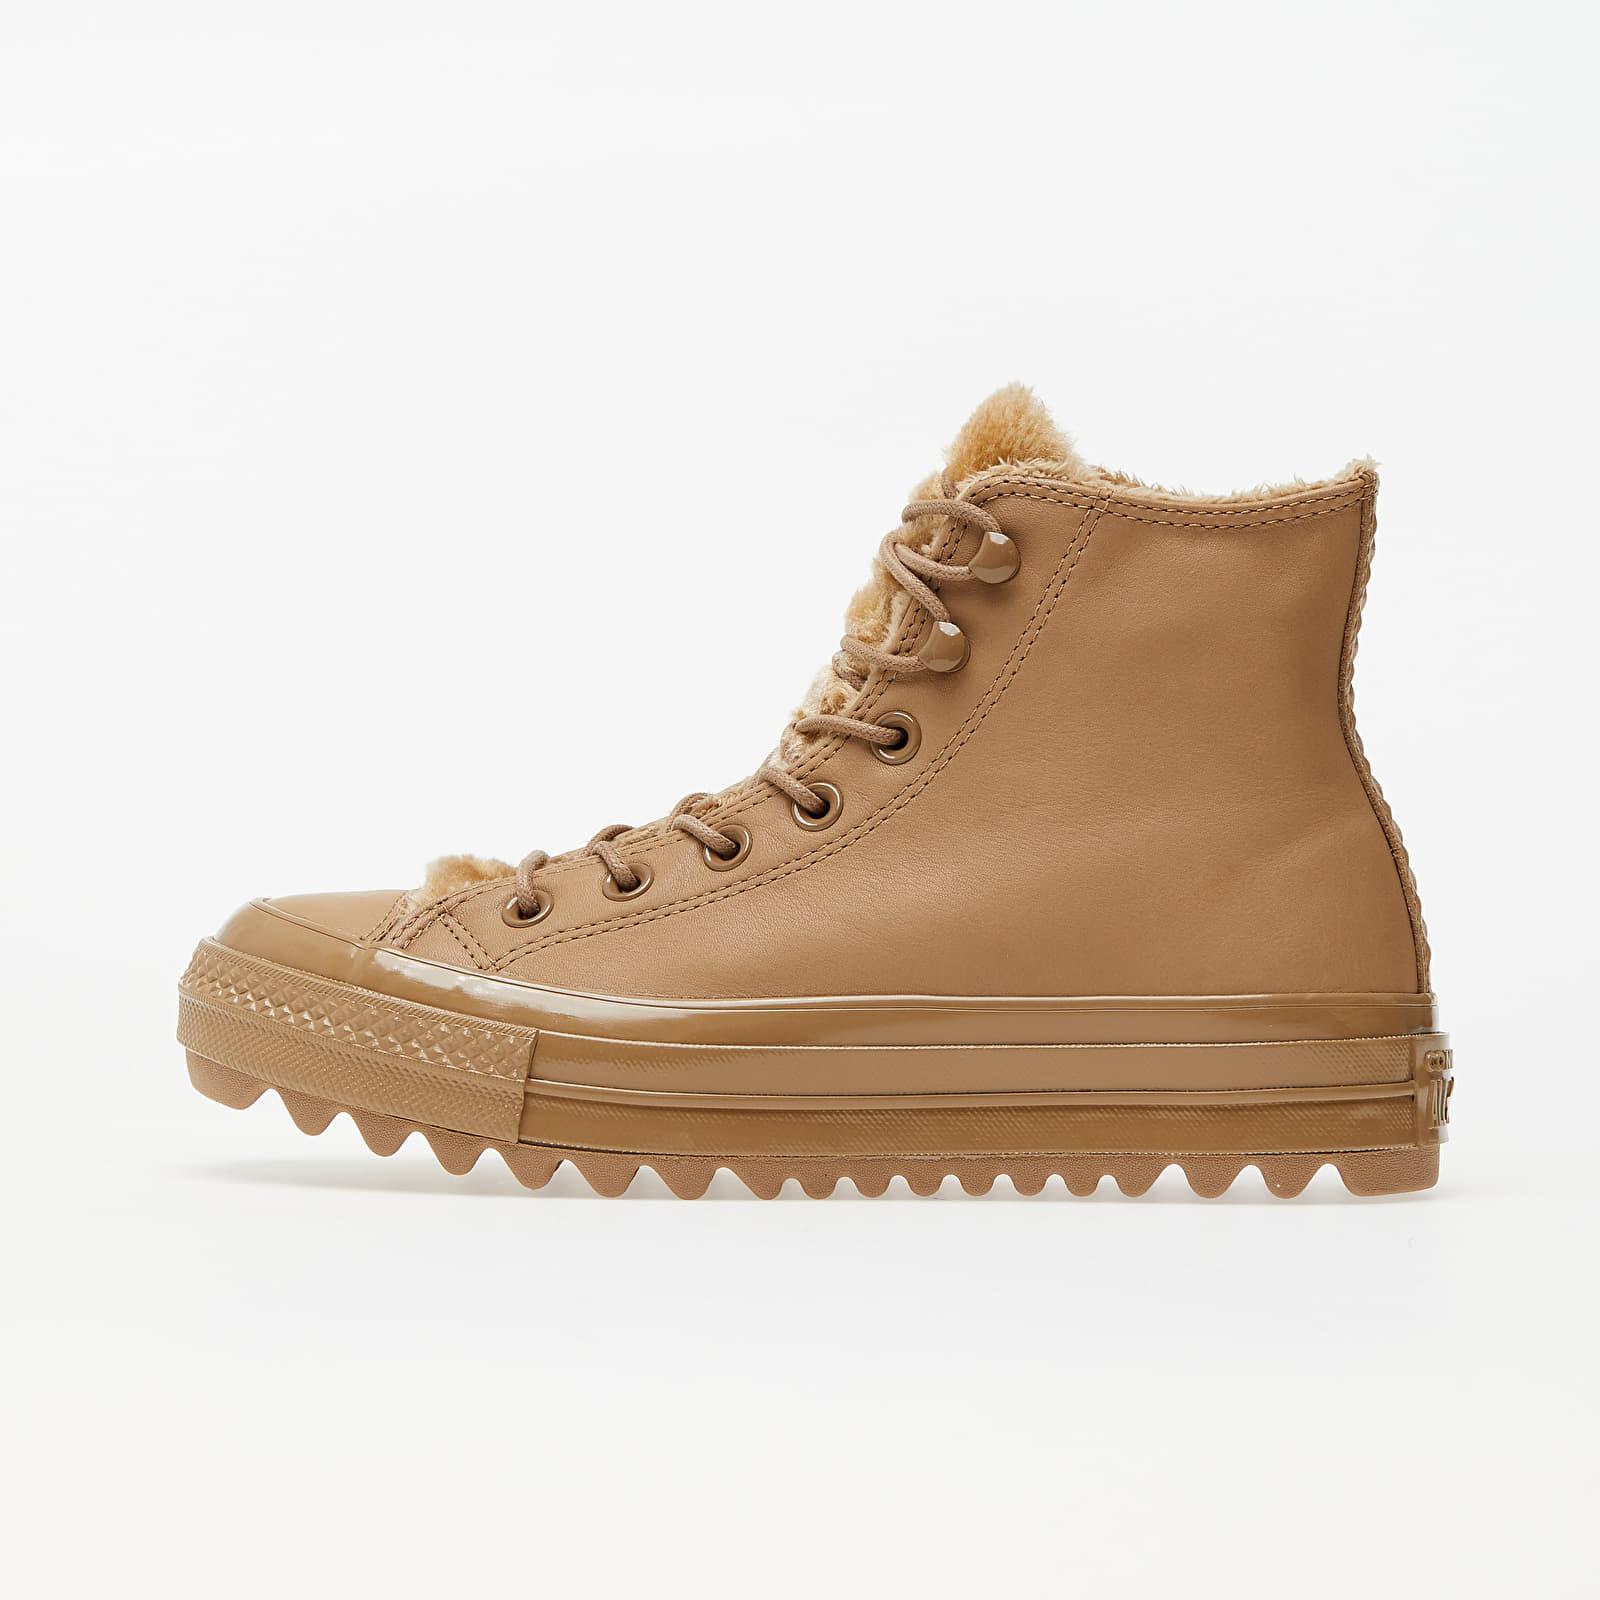 Women's shoes Converse Chuck Taylor All Star Lift Ripple Hi Tan/ Graphite